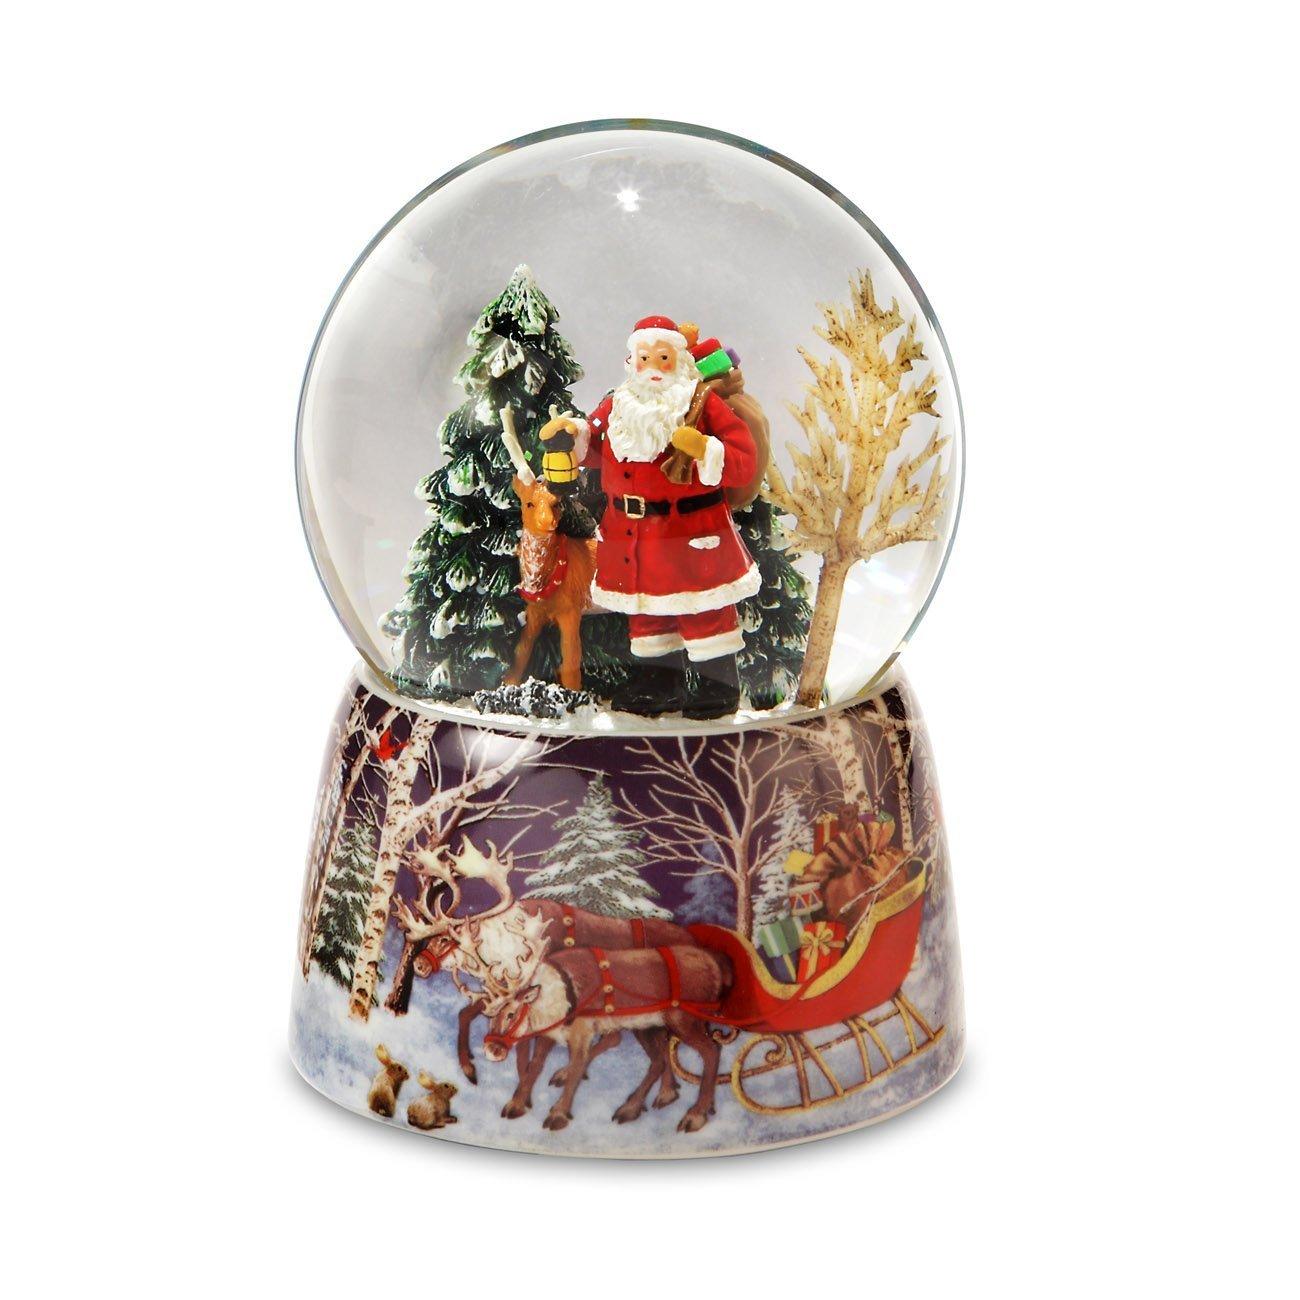 Image of Beautiful Reindeer and Santa Claus Snow Globe